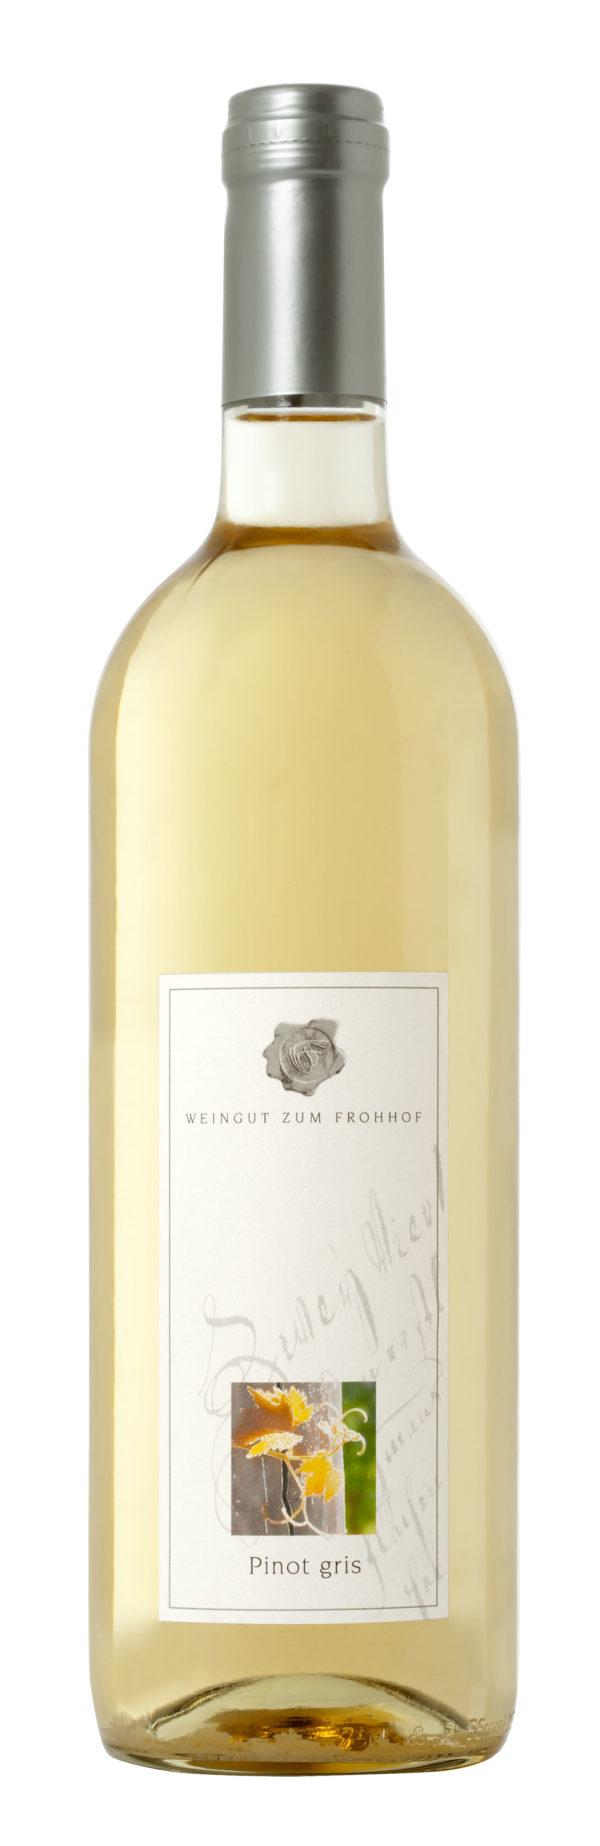 Schweizer Weisswein: Pinot Gris